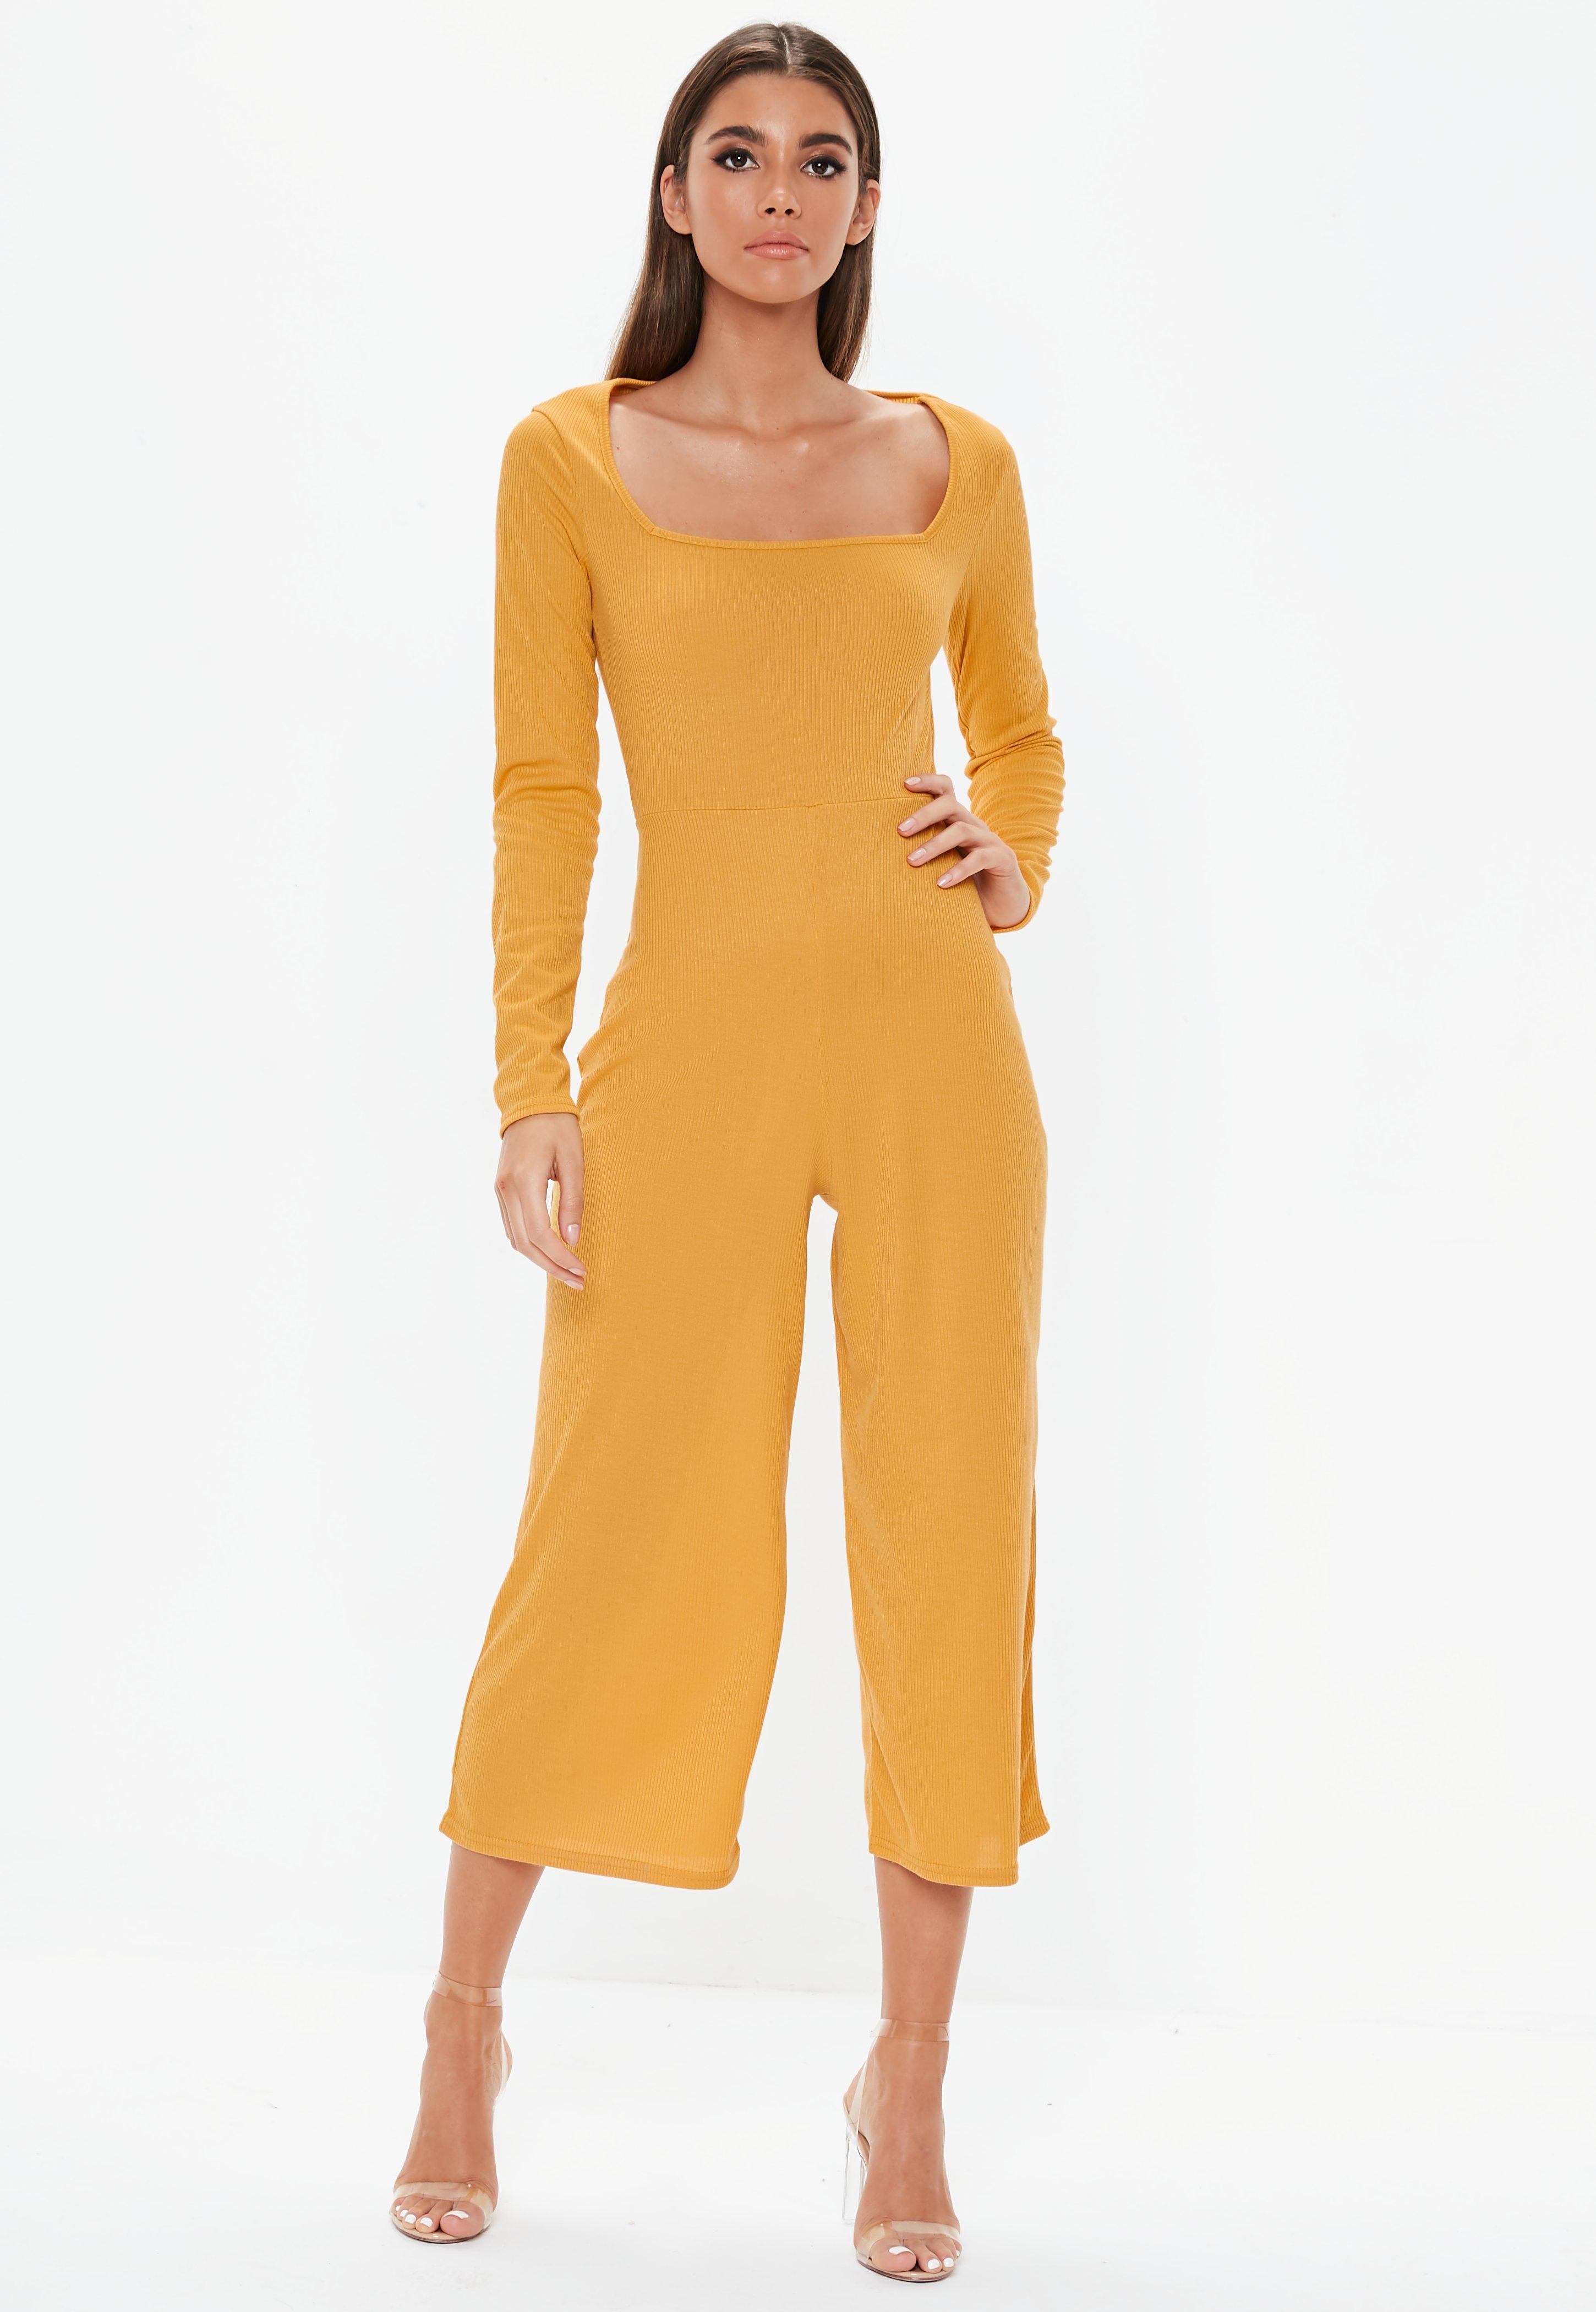 75b0ec4adb00 Mustard Square Neck Ribbed Culotte Jumpsuit